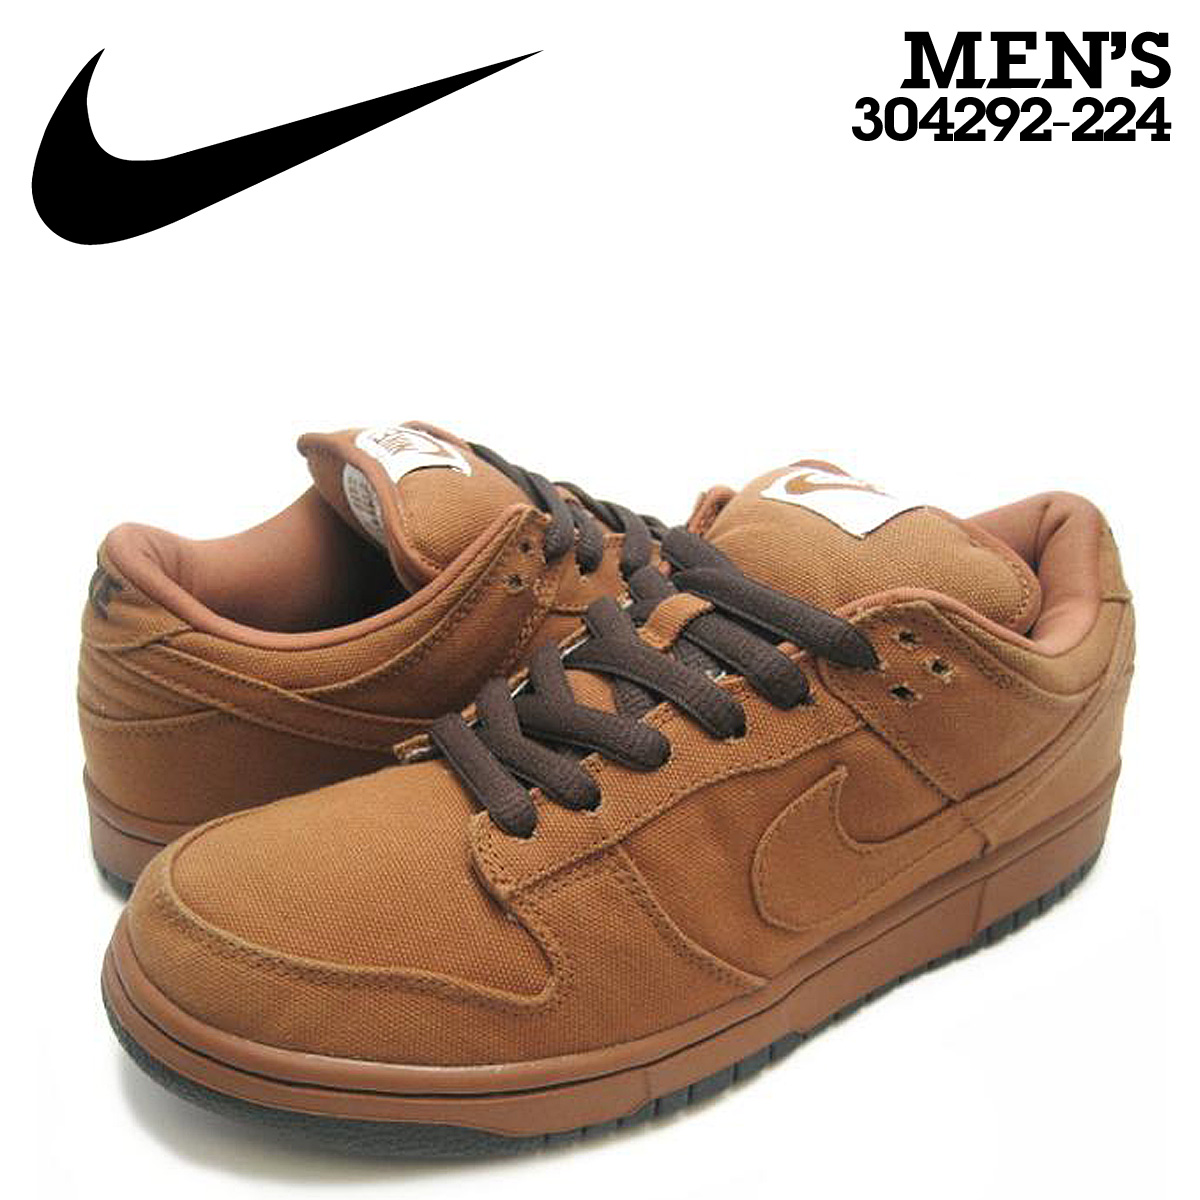 quality design c4da1 c9abb Nike NIKE dunk sneakers DUNK LOW PRO SB CARHARTT dunk low pro S beaker  heart 304,292-224 brown men